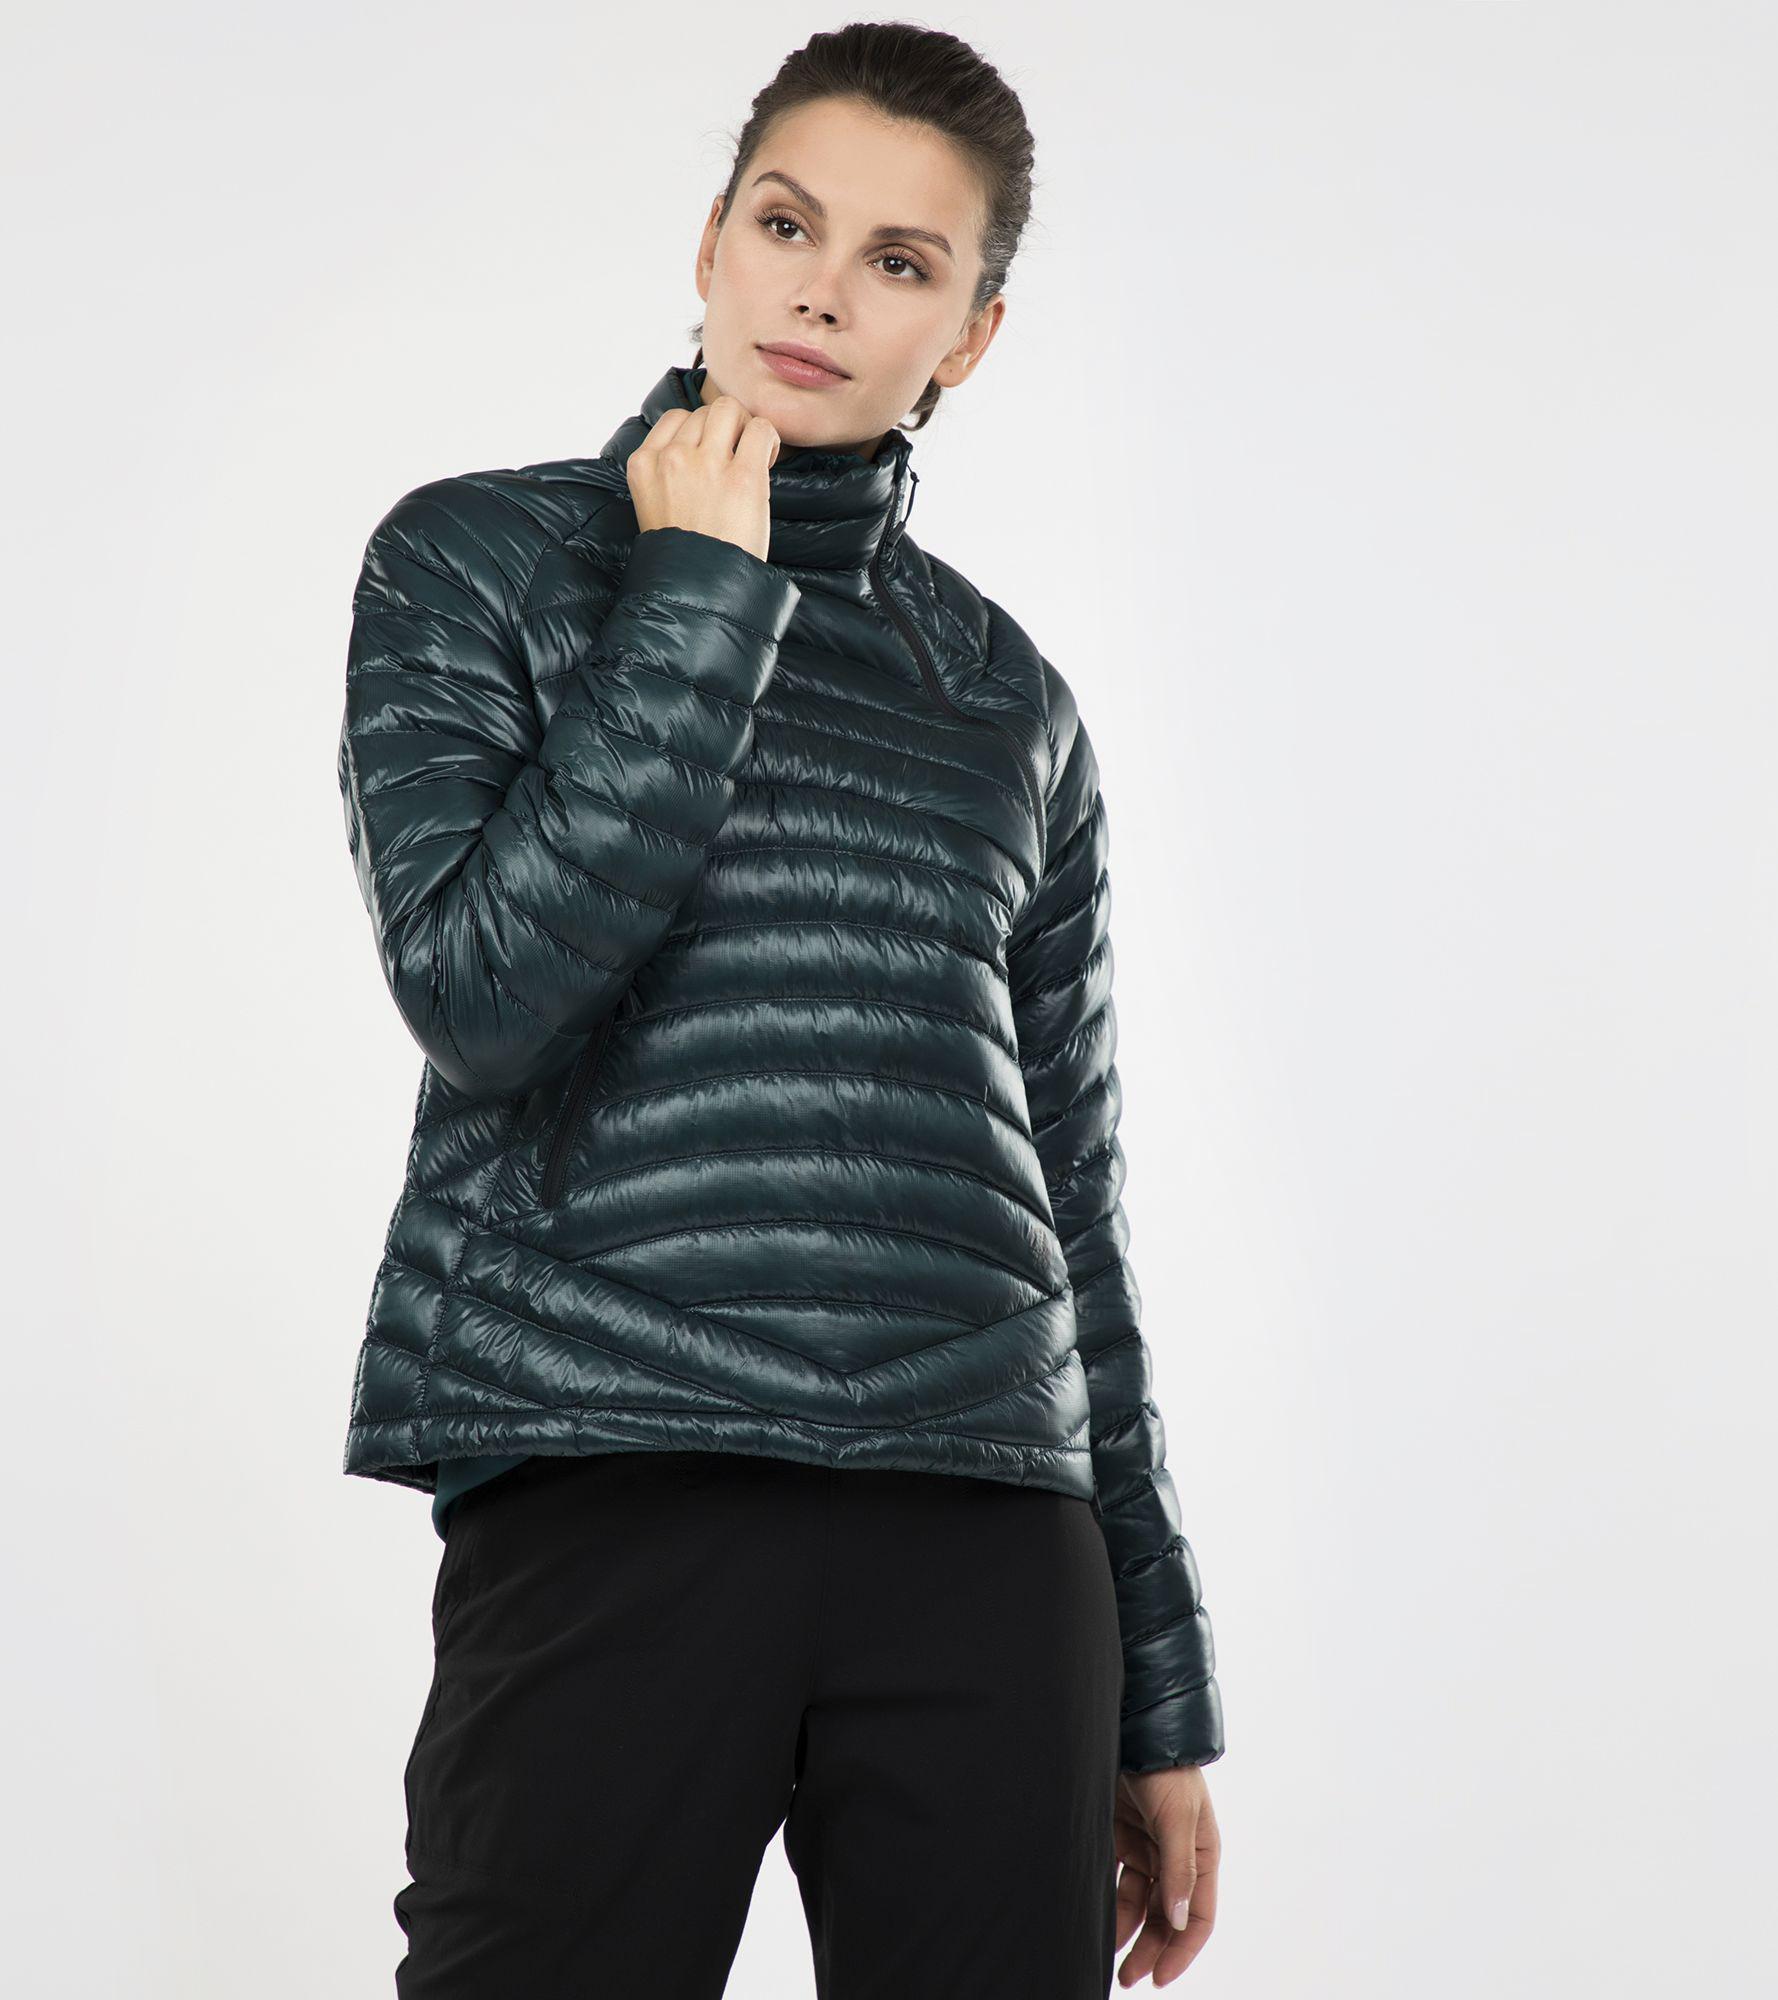 Mountain Hardwear Куртка пуховая женская Mountain Hardwear Ghost Whisperer™, размер 50 цена